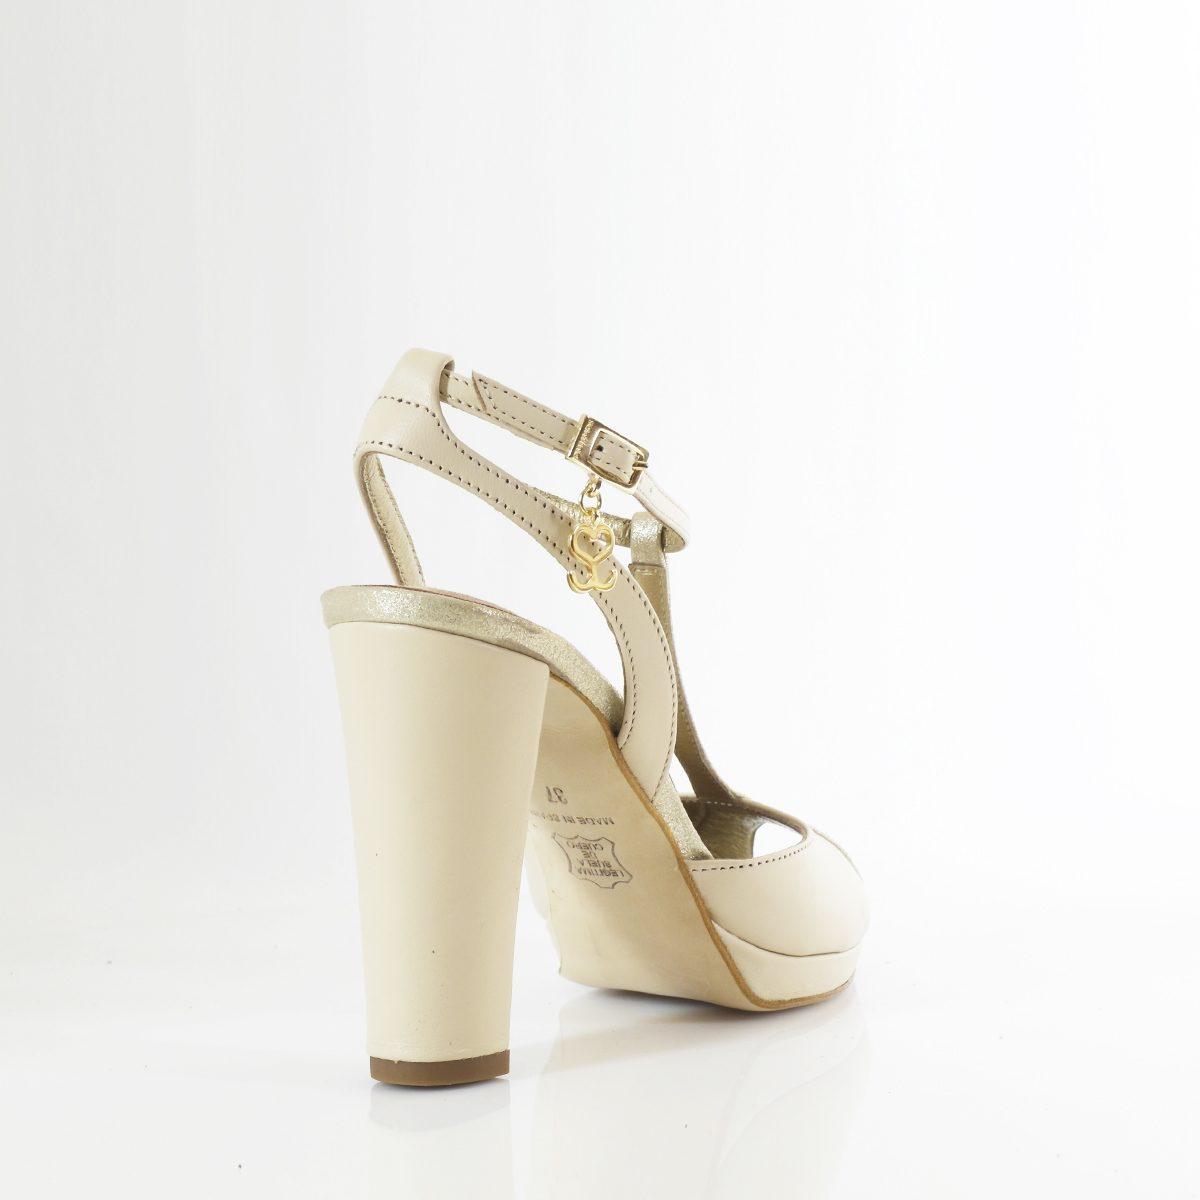 SANDALIA MOD.1637 (10cm) - Zapatos personalizados fiesta